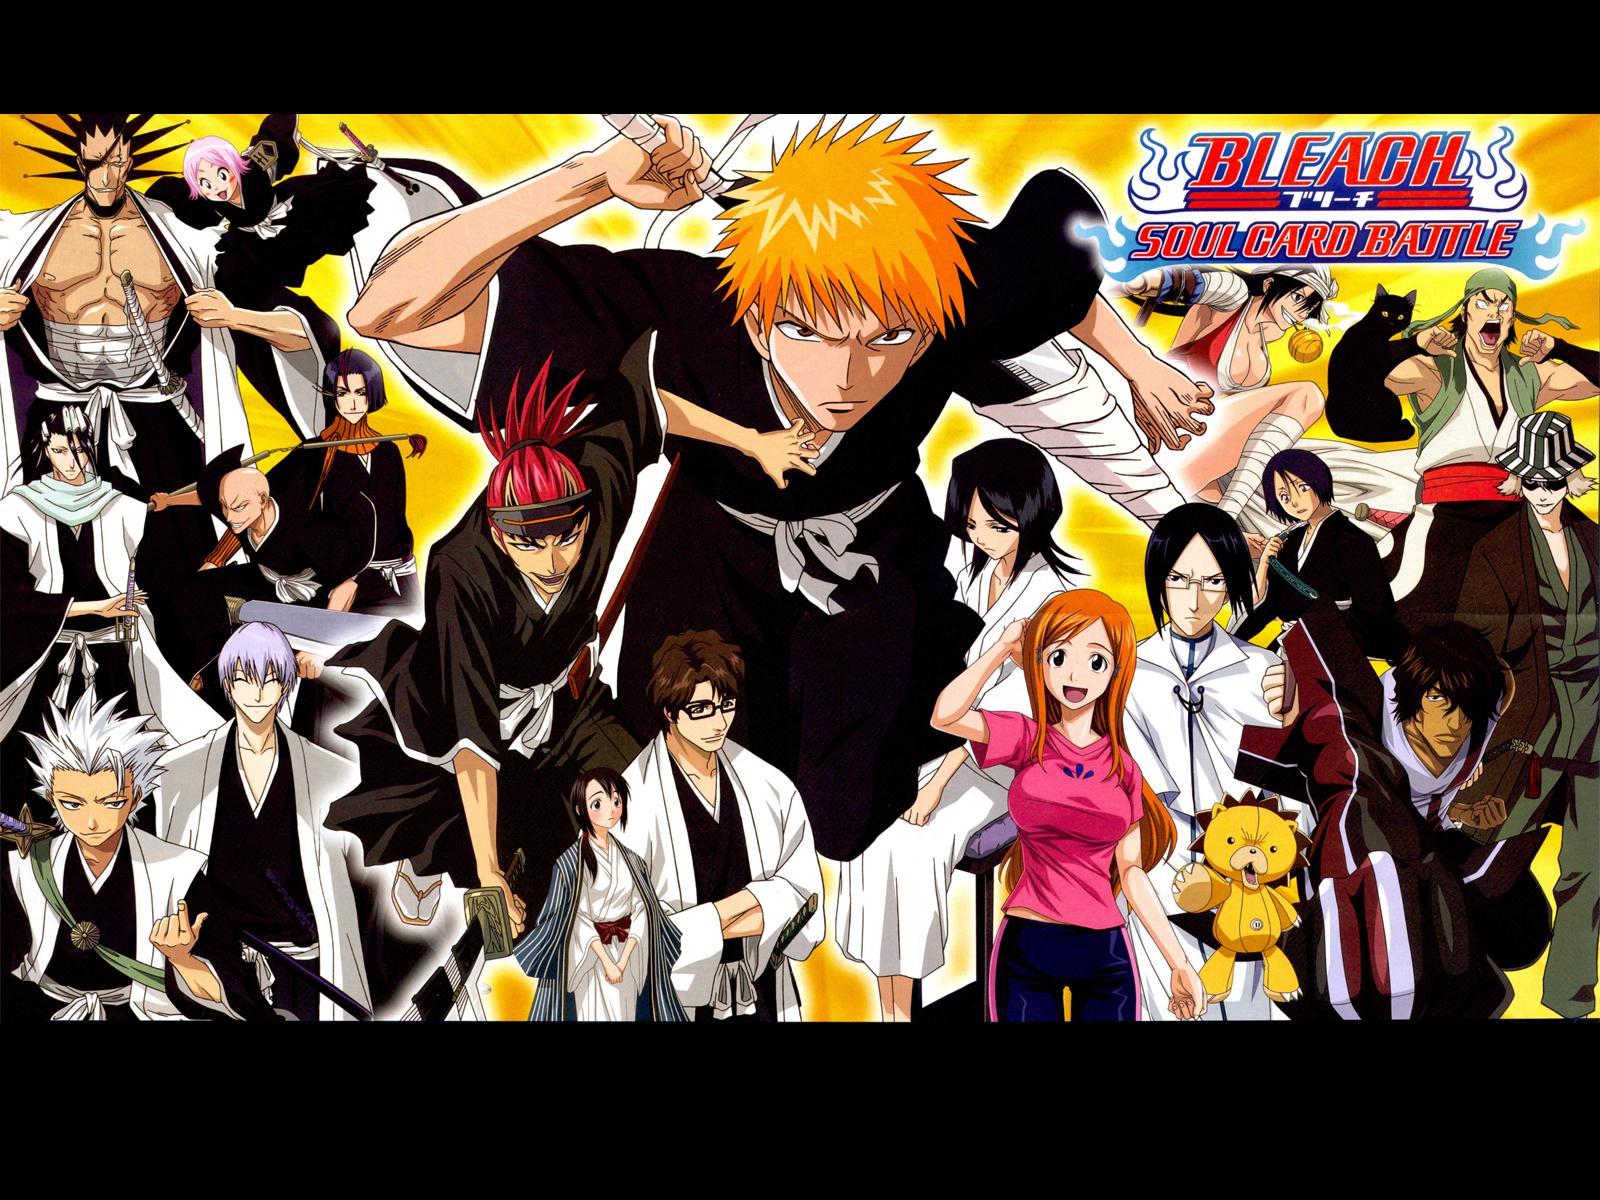 Like Baka Eu Ja Assisti Esse Anime: Start Mania